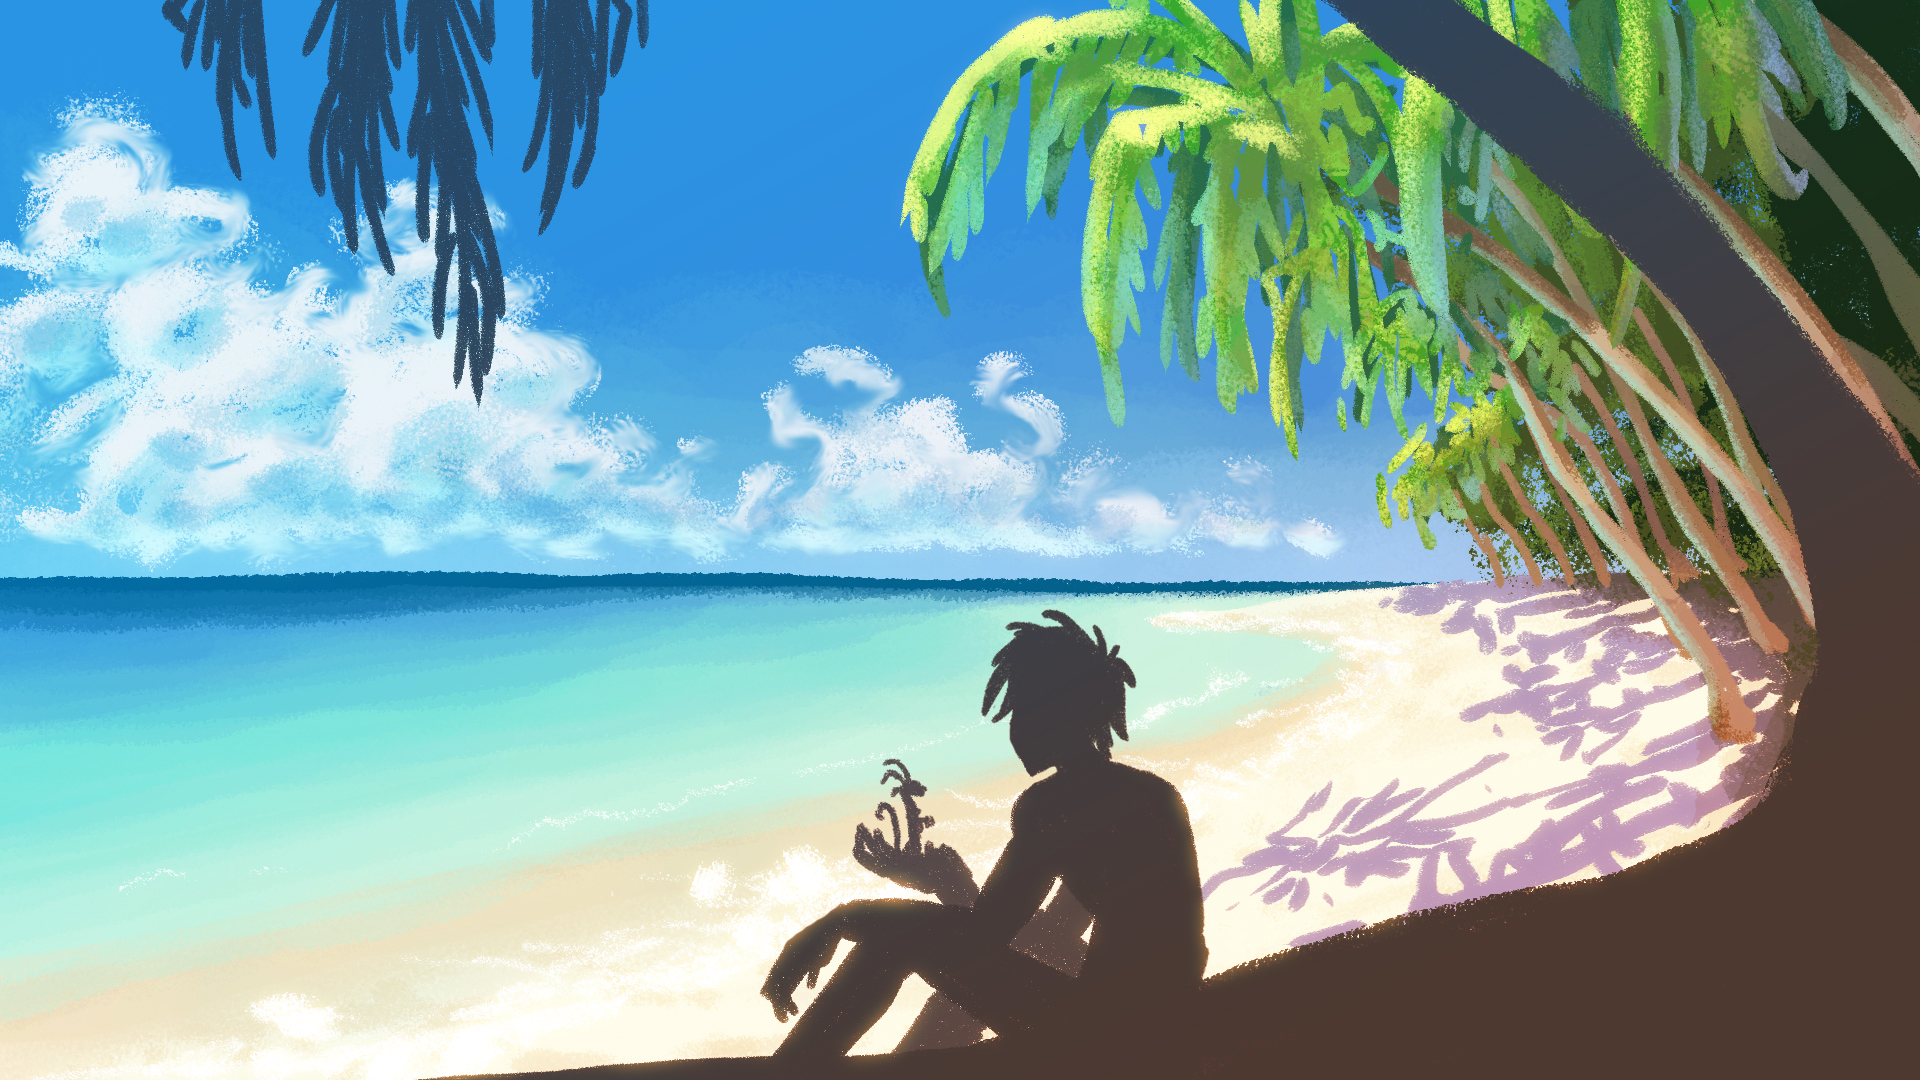 beachscene3_00000 copy.jpg